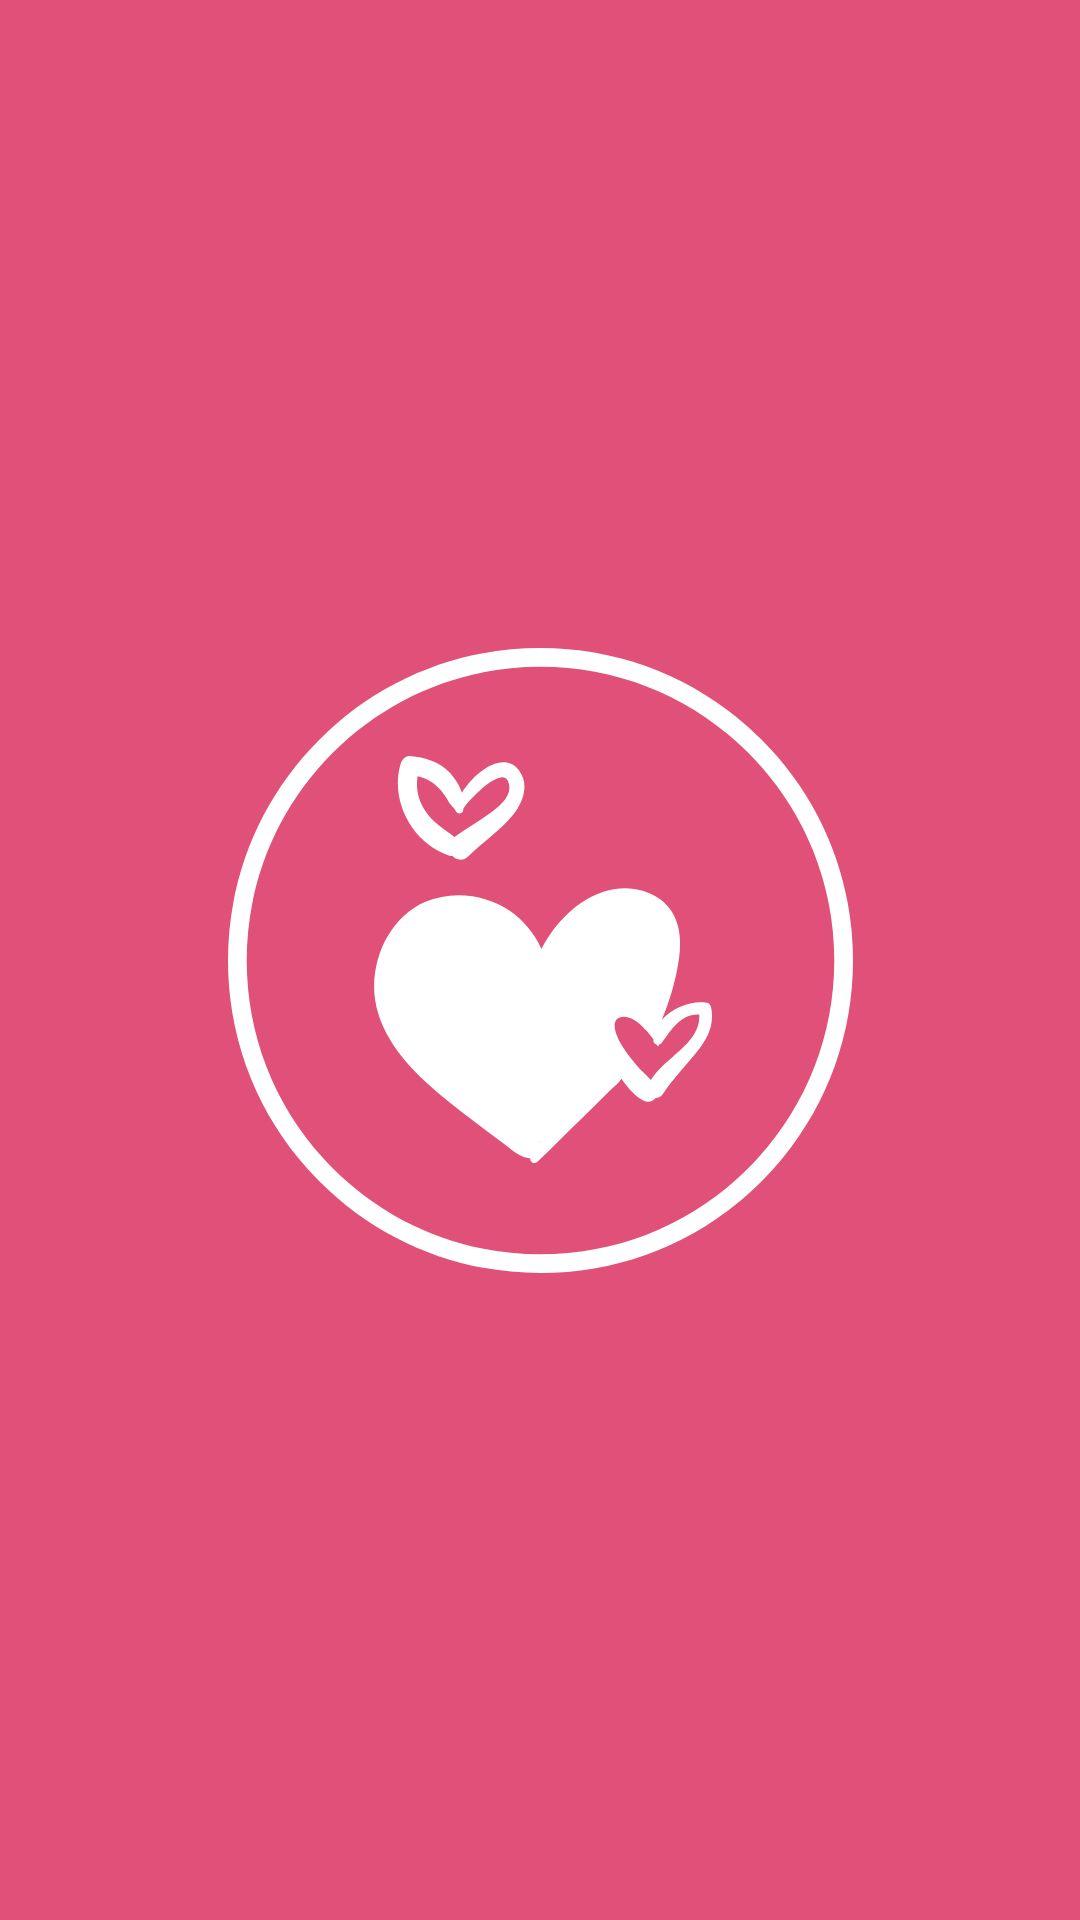 Hearts Instagram Highlight Covers In 2019 Instagram Highlight